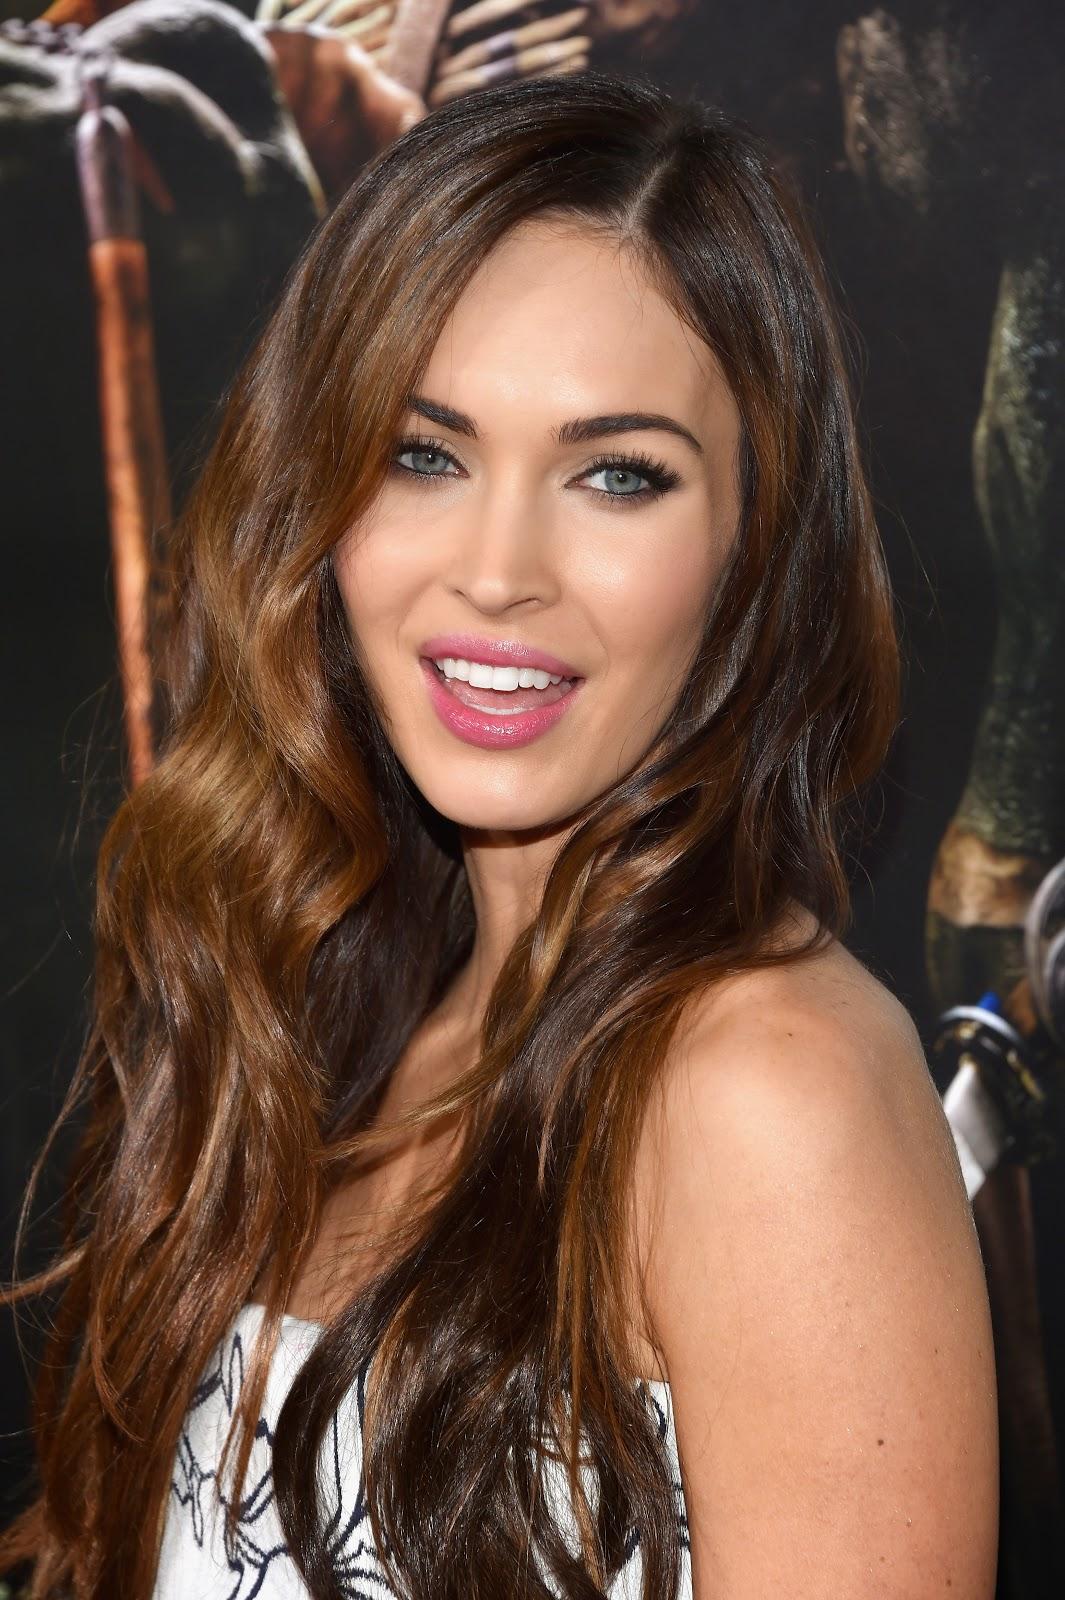 Megan Fox HD Pictures at Teenage Mutant Ninja Turtles Premiere